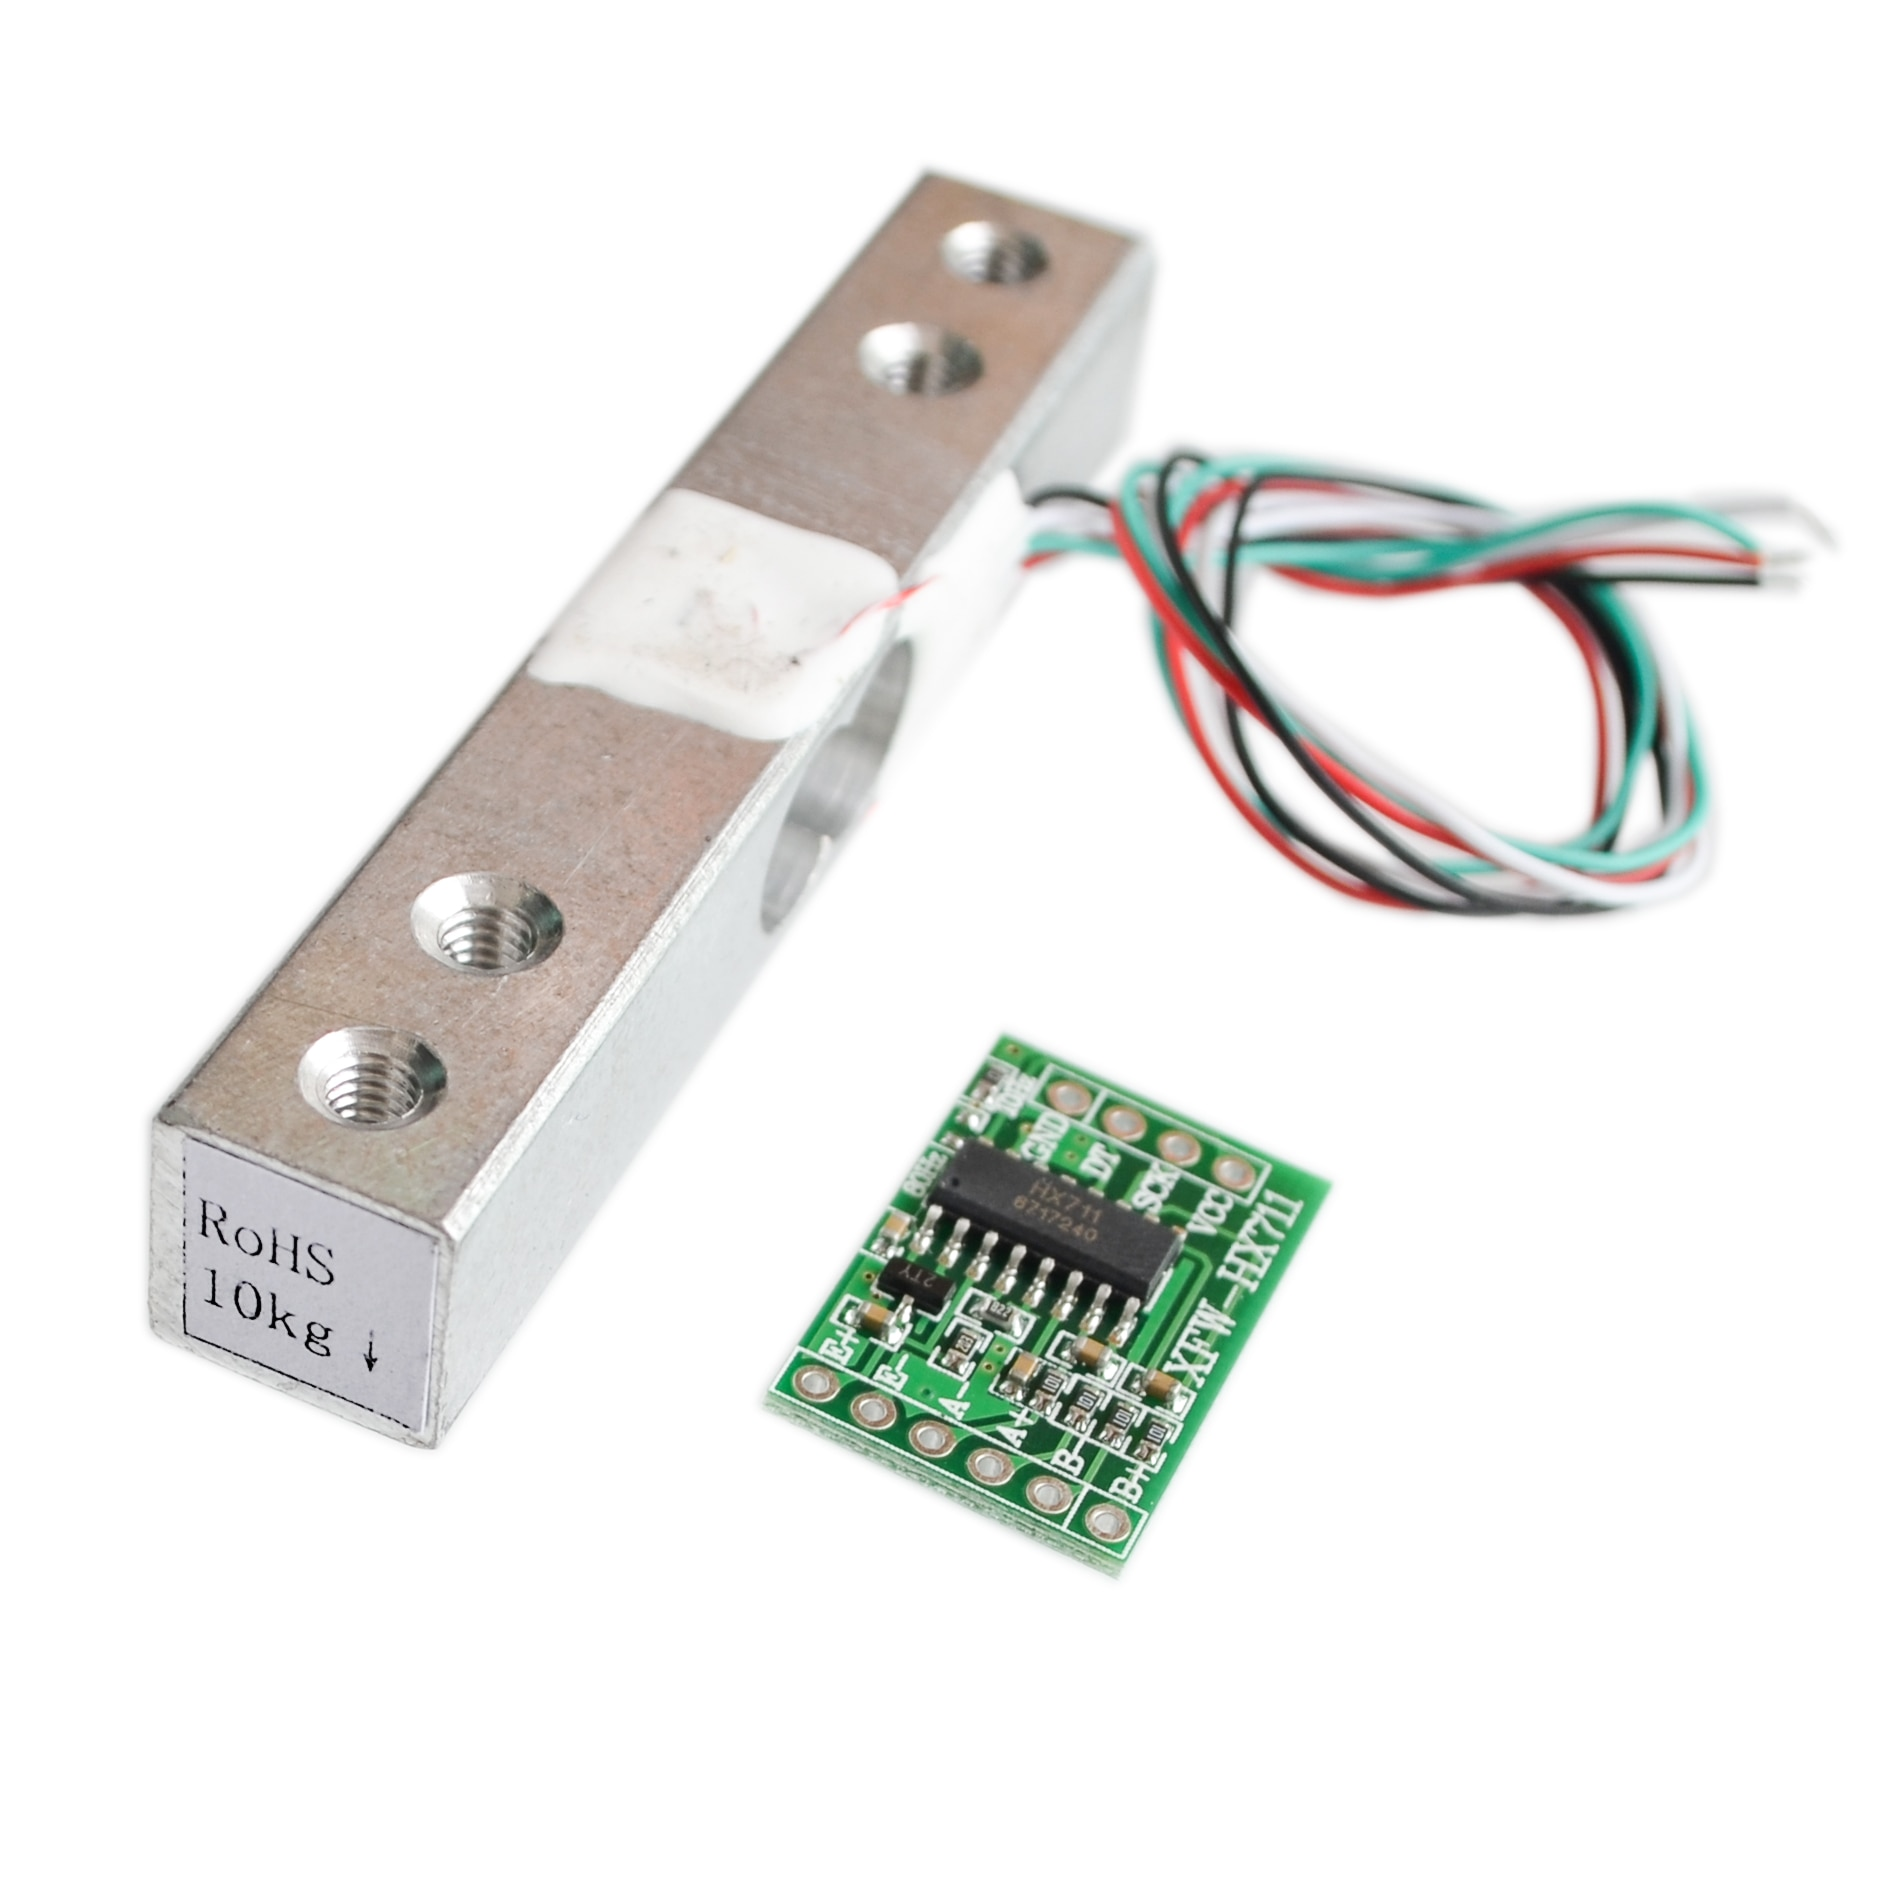 Sensor de peso Digital de célula de carga 10KG balanza de cocina electrónica portátil + HX711 sensores de pesaje MÓDULO DE CA para